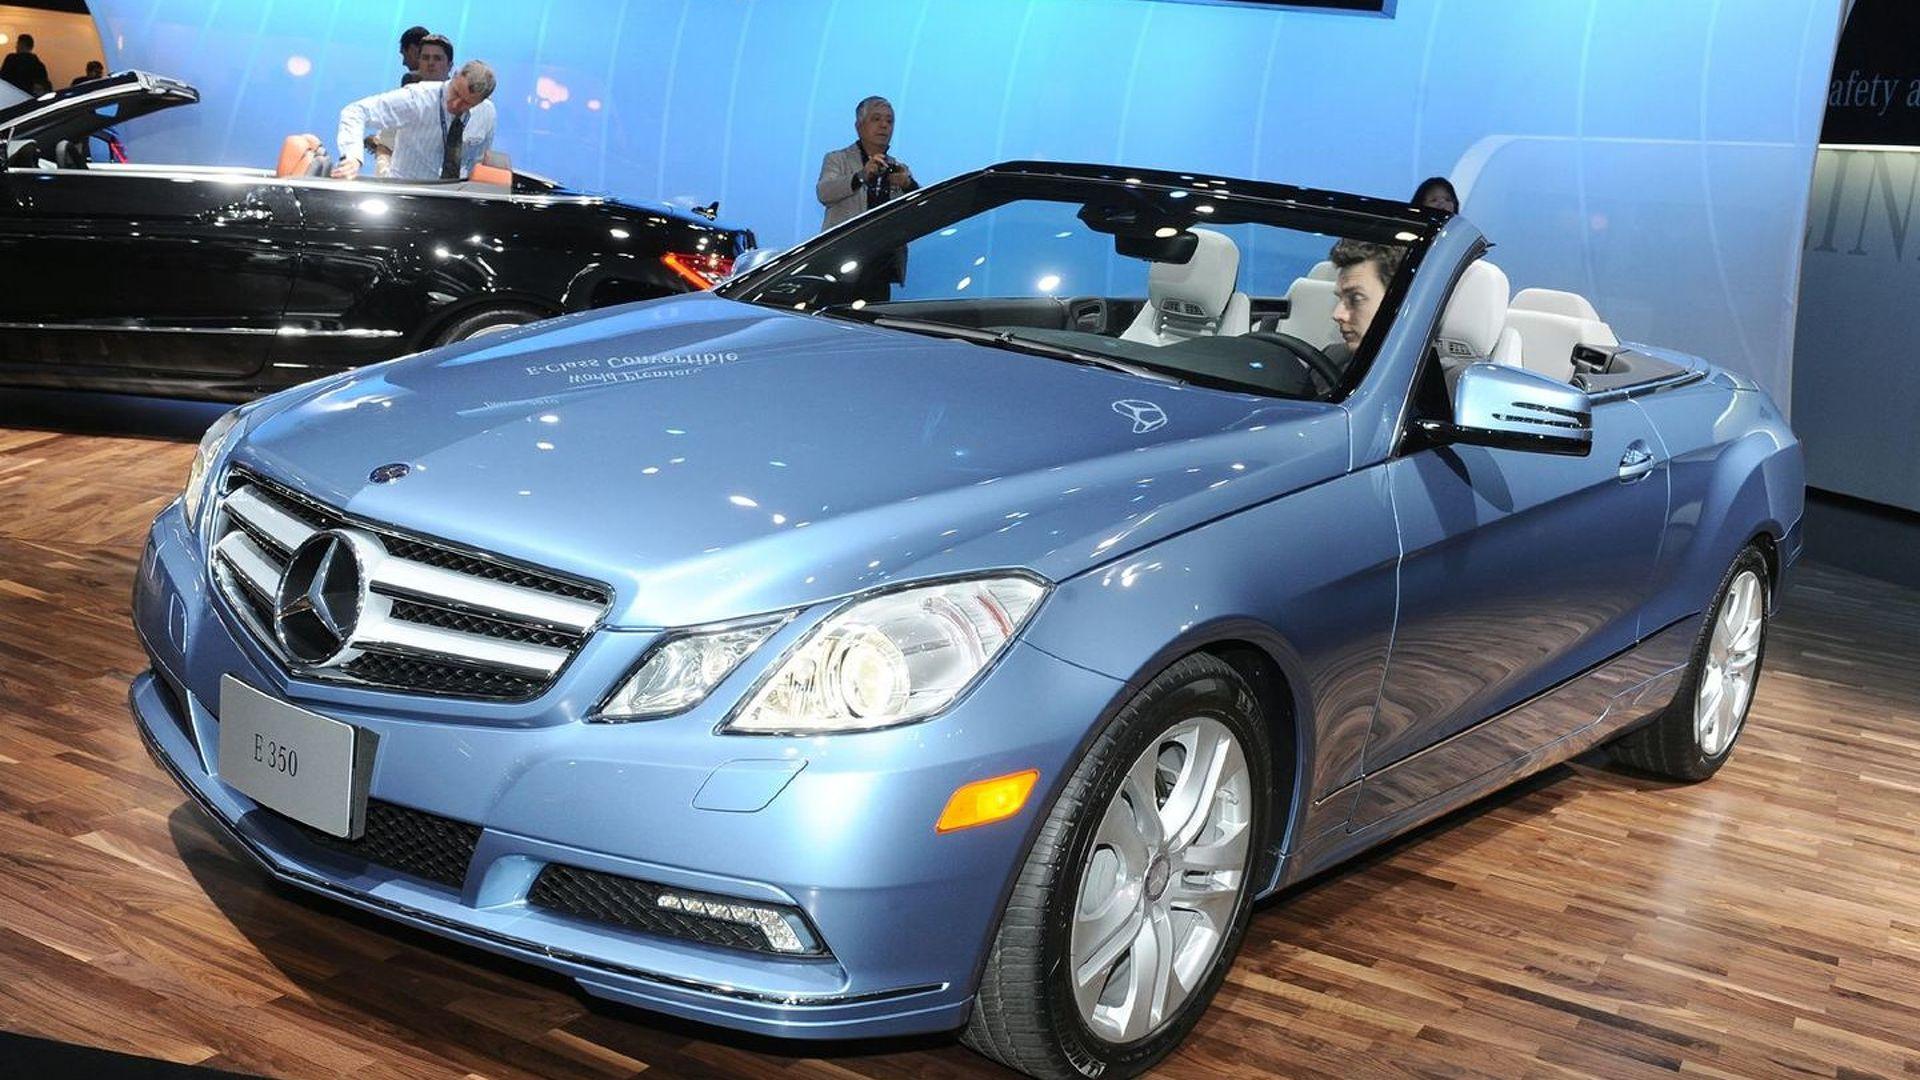 2010 mercedes benz e class cabriolet world debut in detroit. Black Bedroom Furniture Sets. Home Design Ideas